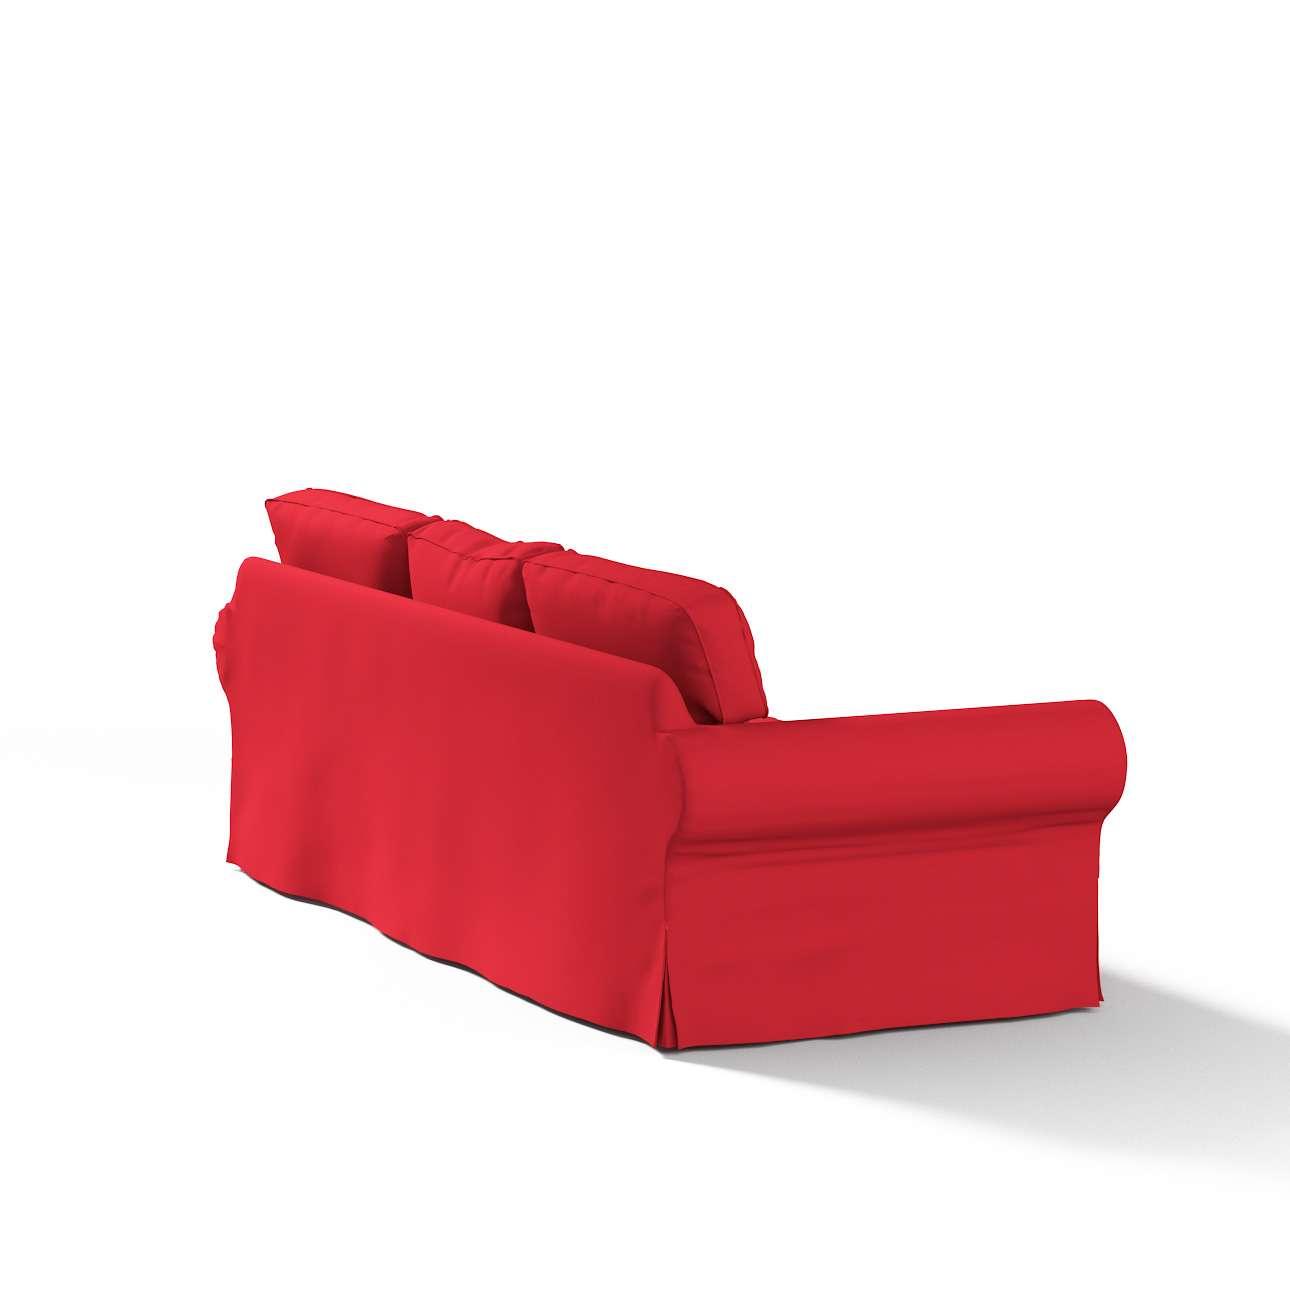 Ektorp 3-Sitzer Sofabezug nicht ausklappbar Sofabezug für  Ektorp 3-Sitzer nicht ausklappbar von der Kollektion Cotton Panama, Stoff: 702-04